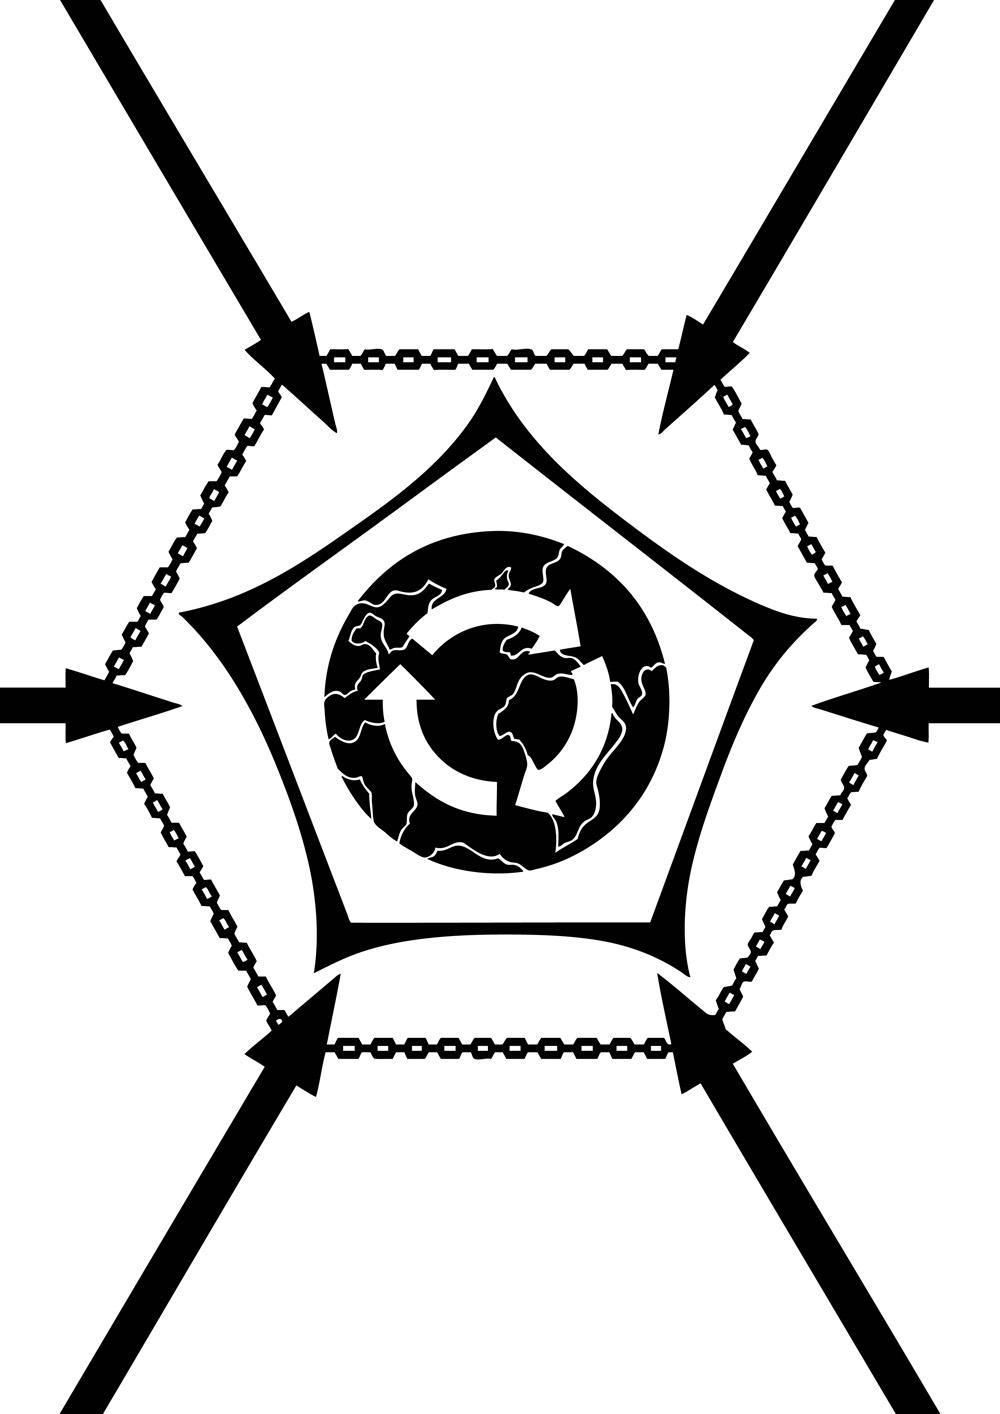 SCP-2000 - 데우스 엑스 마키나